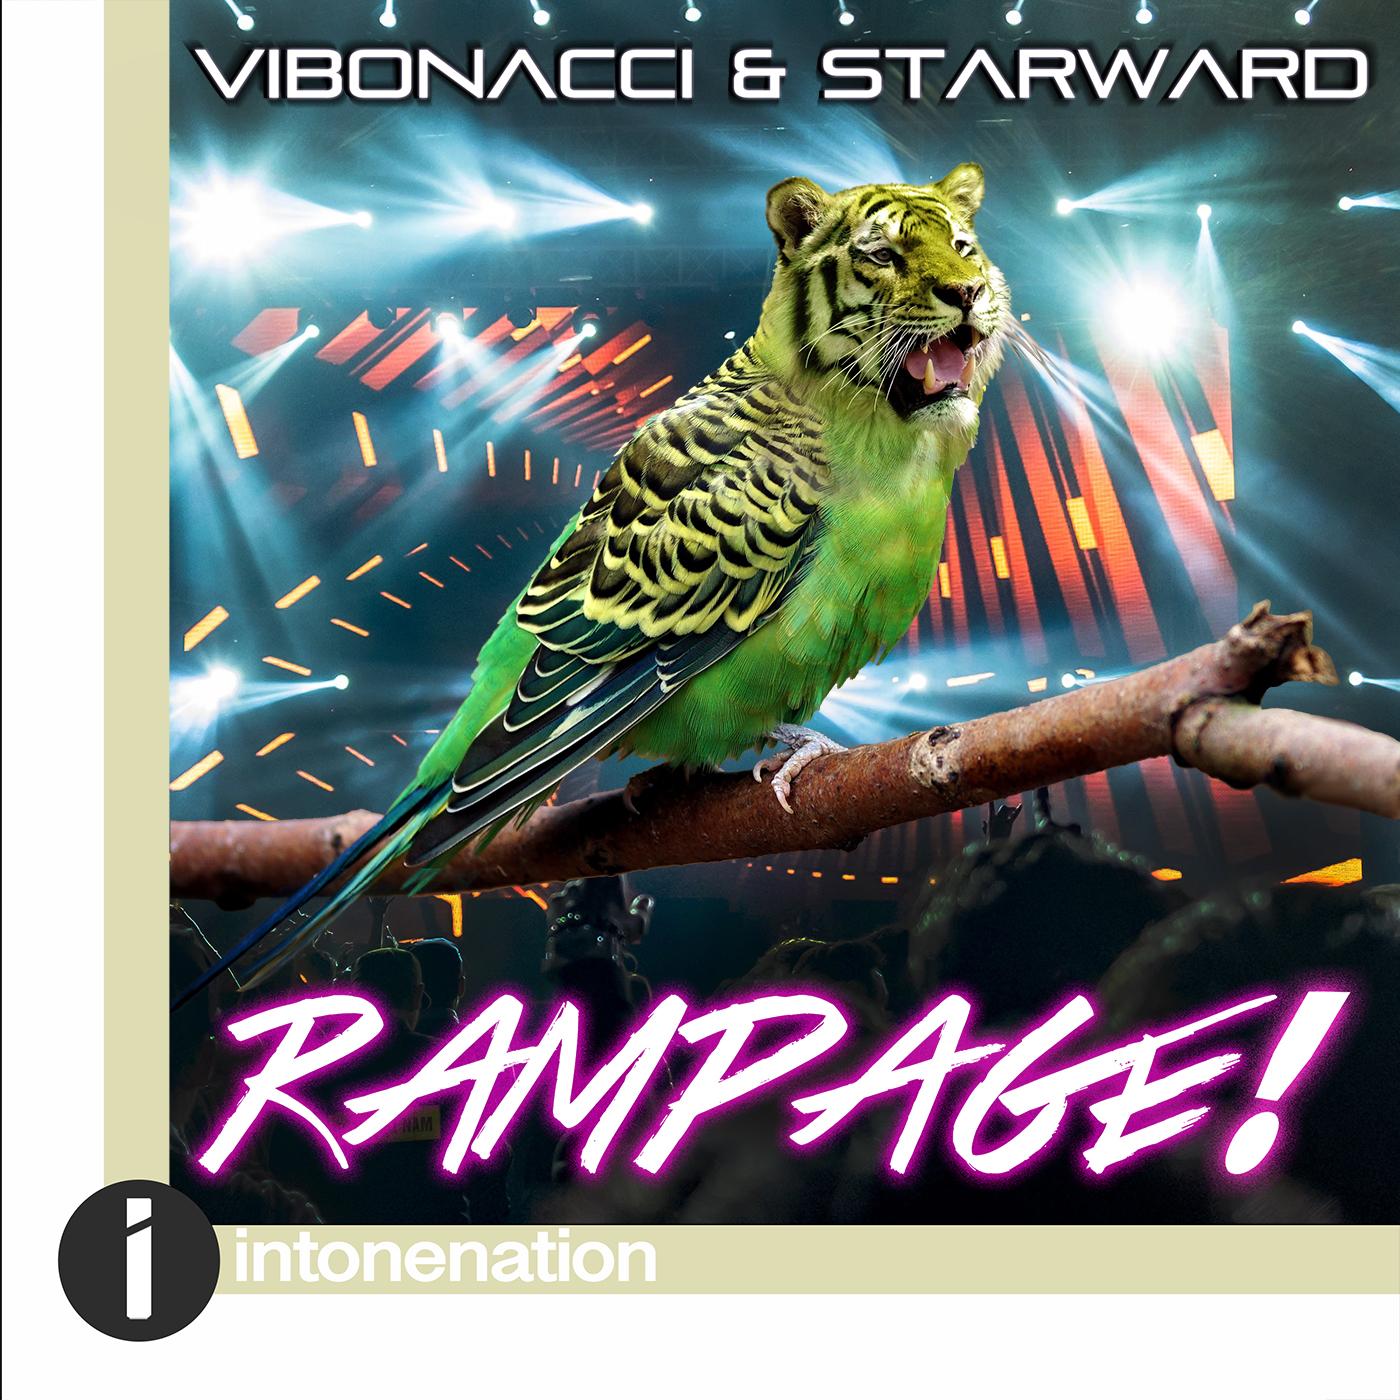 INT_V&S_RAMPAGE!_covart_FNL1.4X1.4.jpg